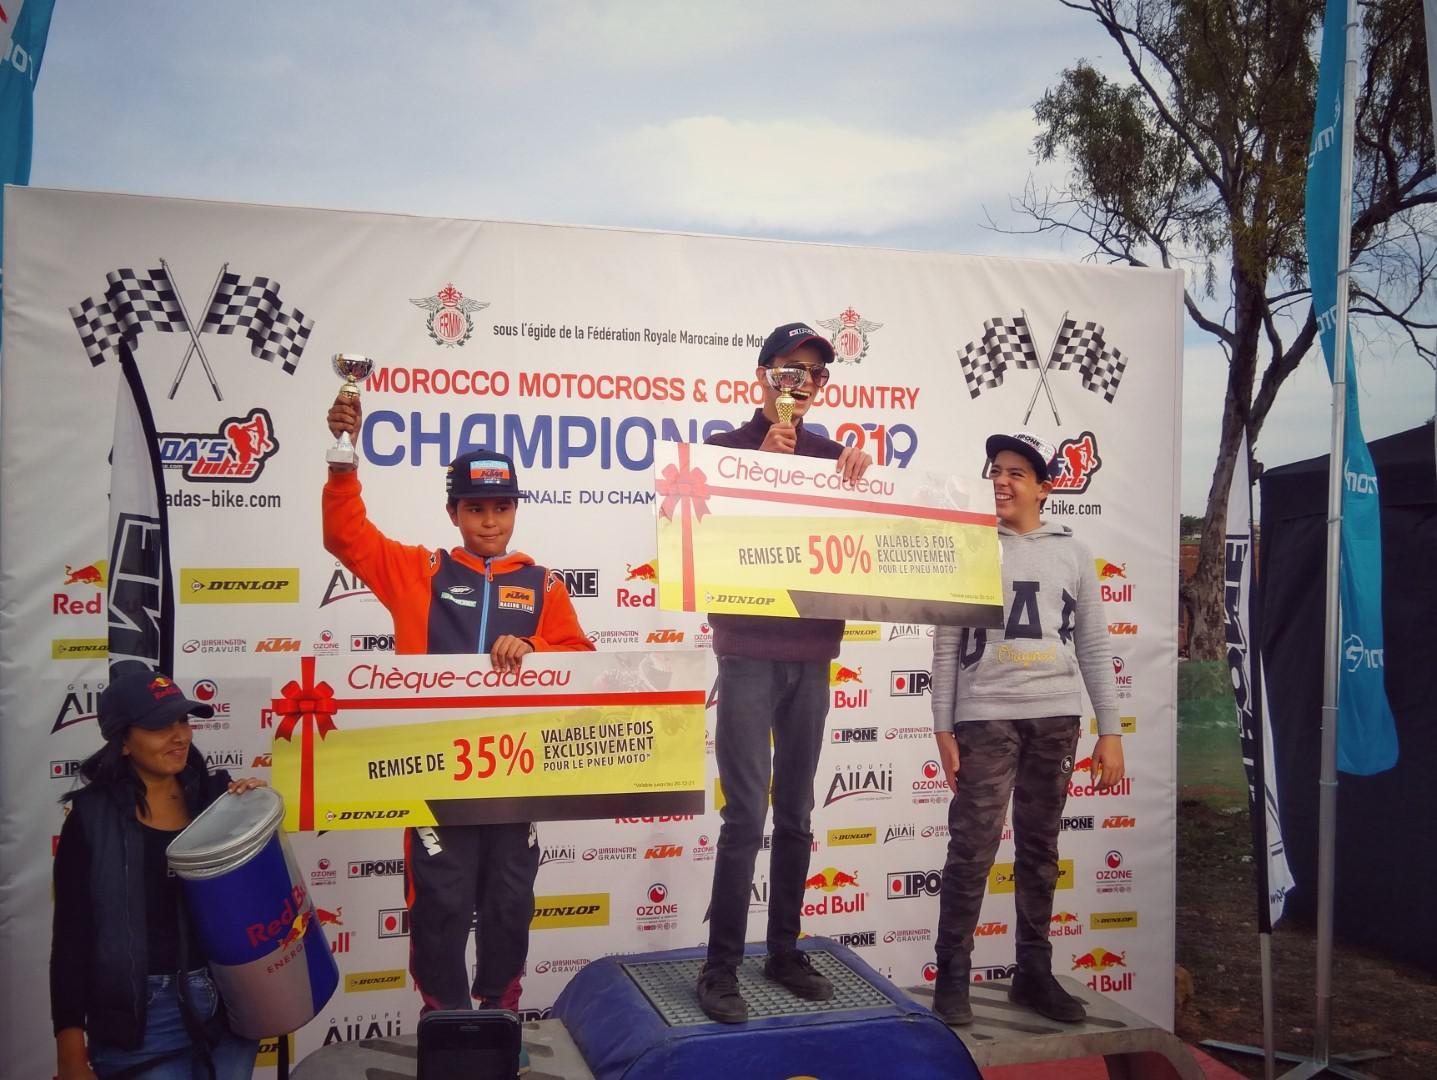 finale-du-championnat-du-maroc-de-motocross-et-cross-country-1164-5.jpg